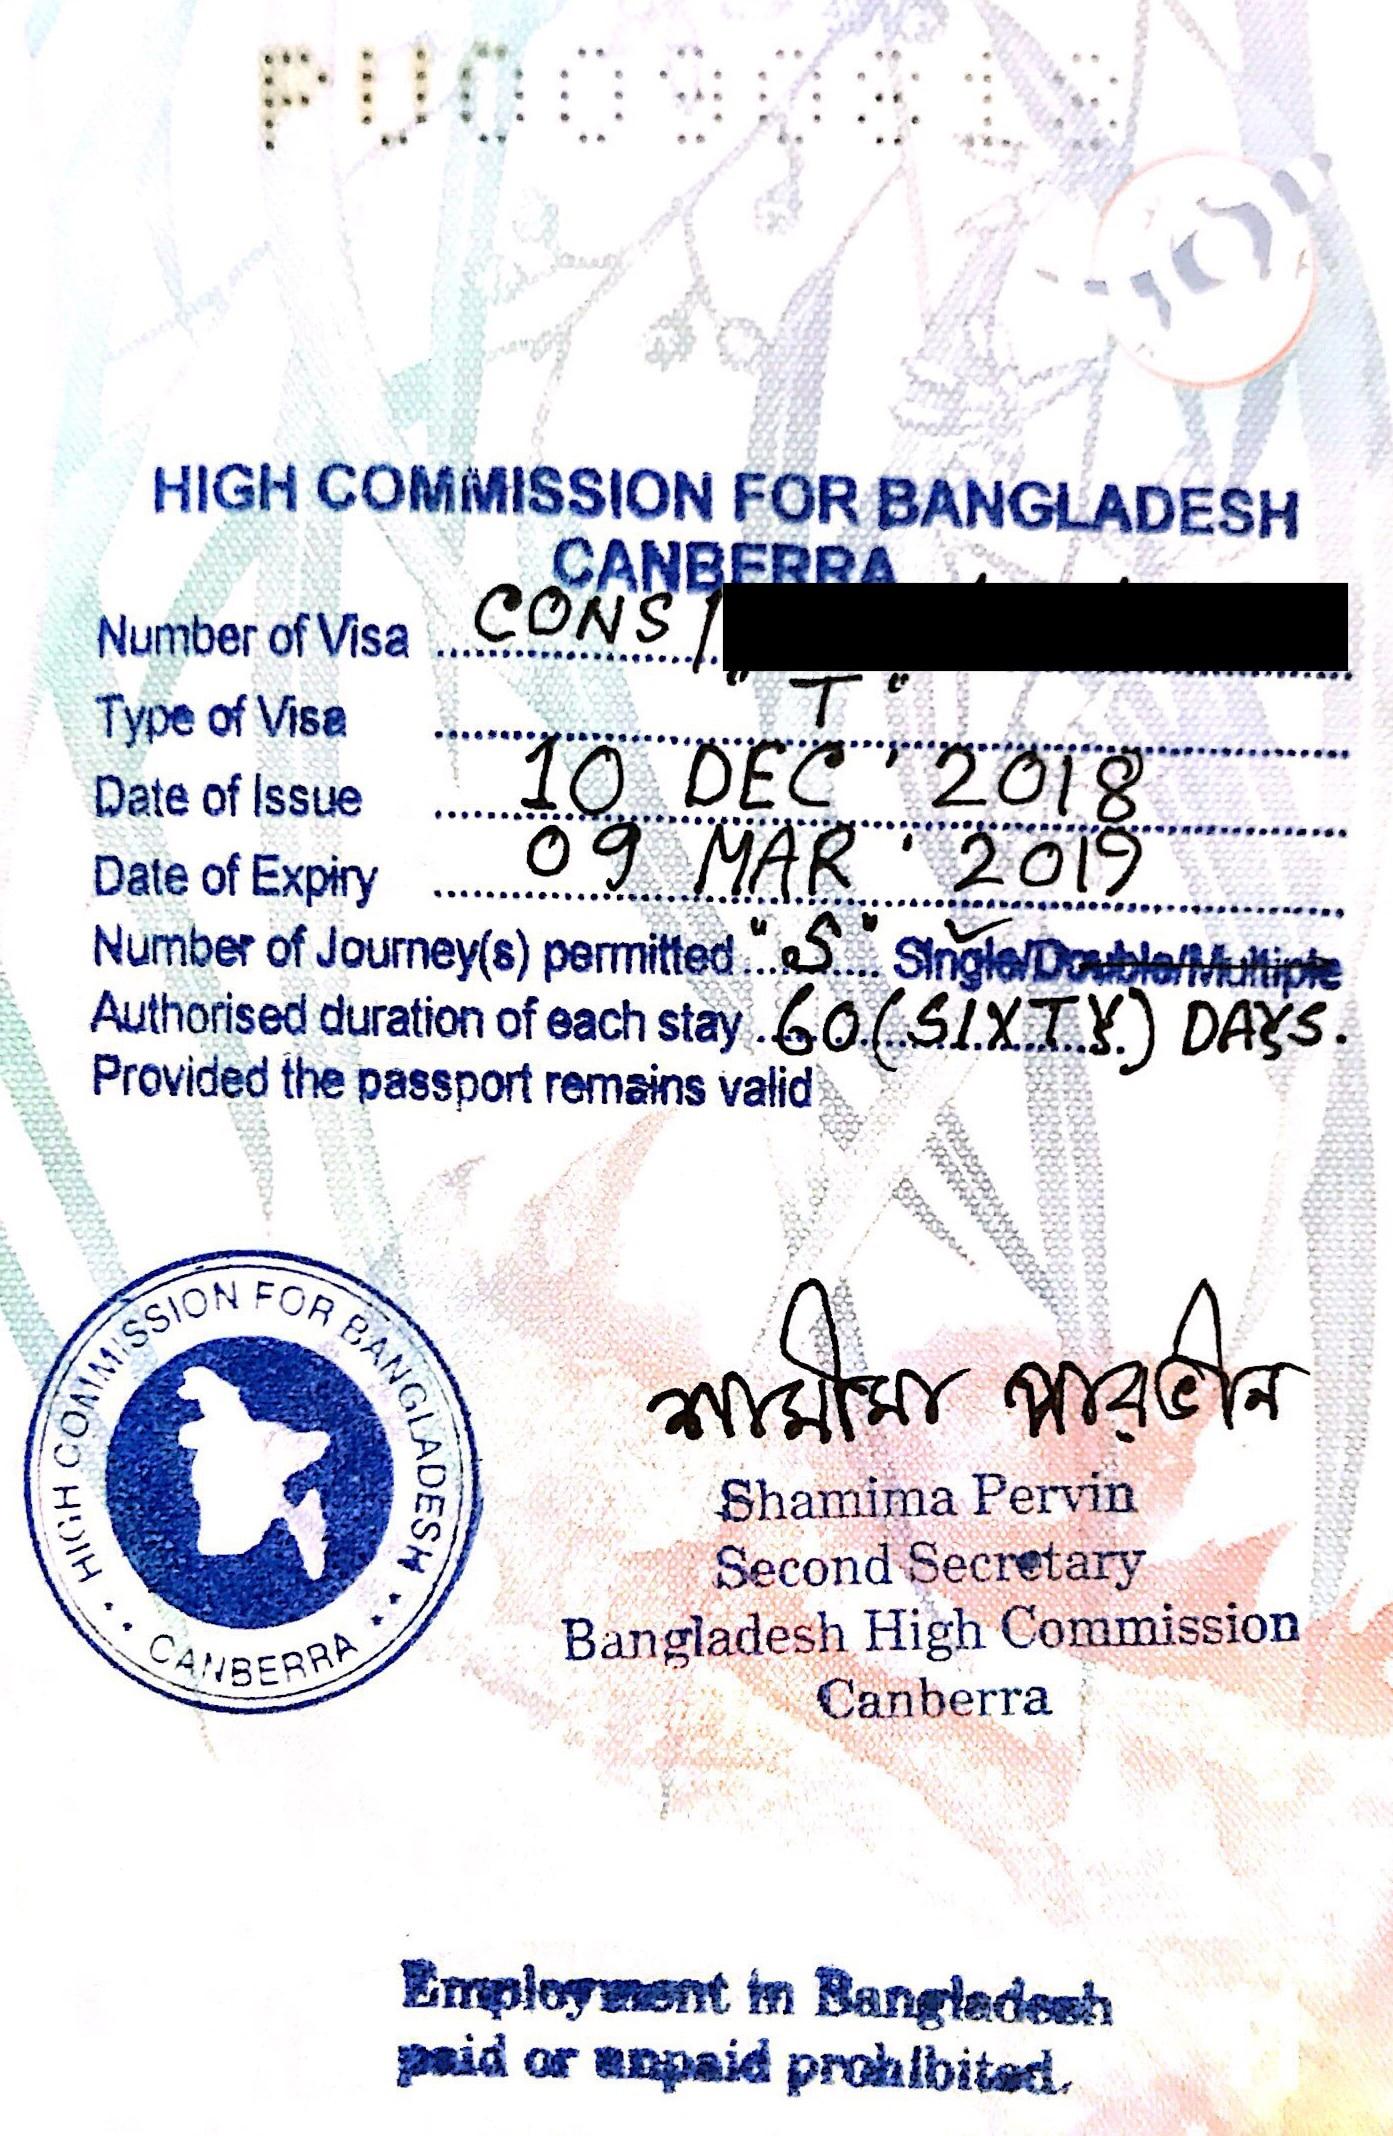 Rohingya refugees in Australia caught up in Bangladesh visa scam